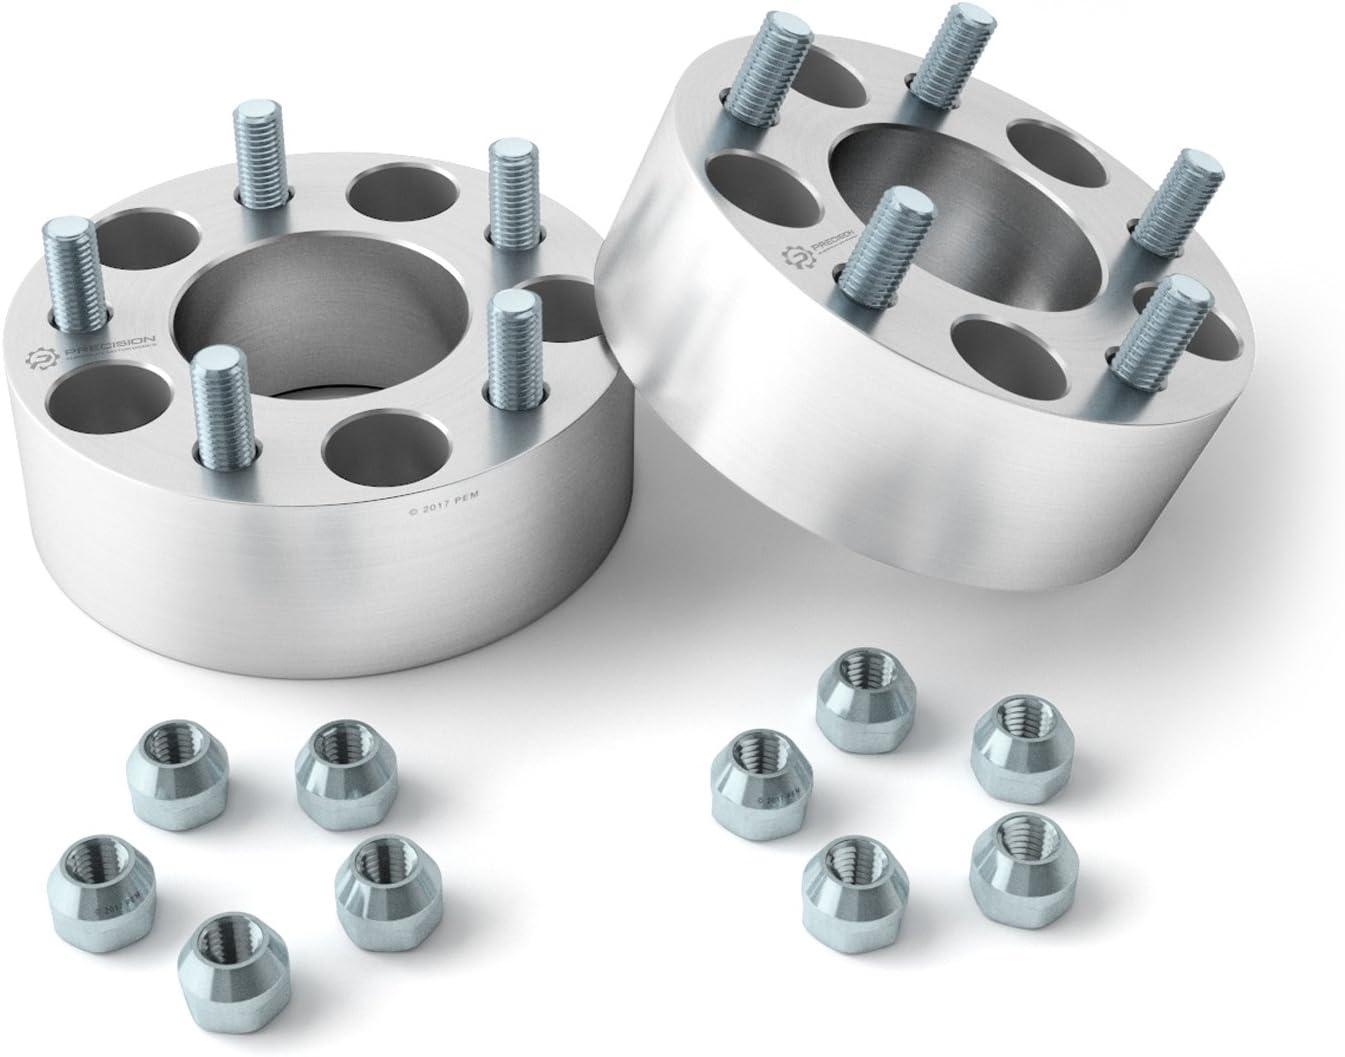 RockTrix 4pcs 1.5 inch Wheel Adapters 5x5.5 to 5x135 5x139.7 to 5x135 with 1//2x20 Studs for Dodge Ram 1500 Dakota Durango Ford F100 F150 Bronco Spacers Changes Bolt Pattern